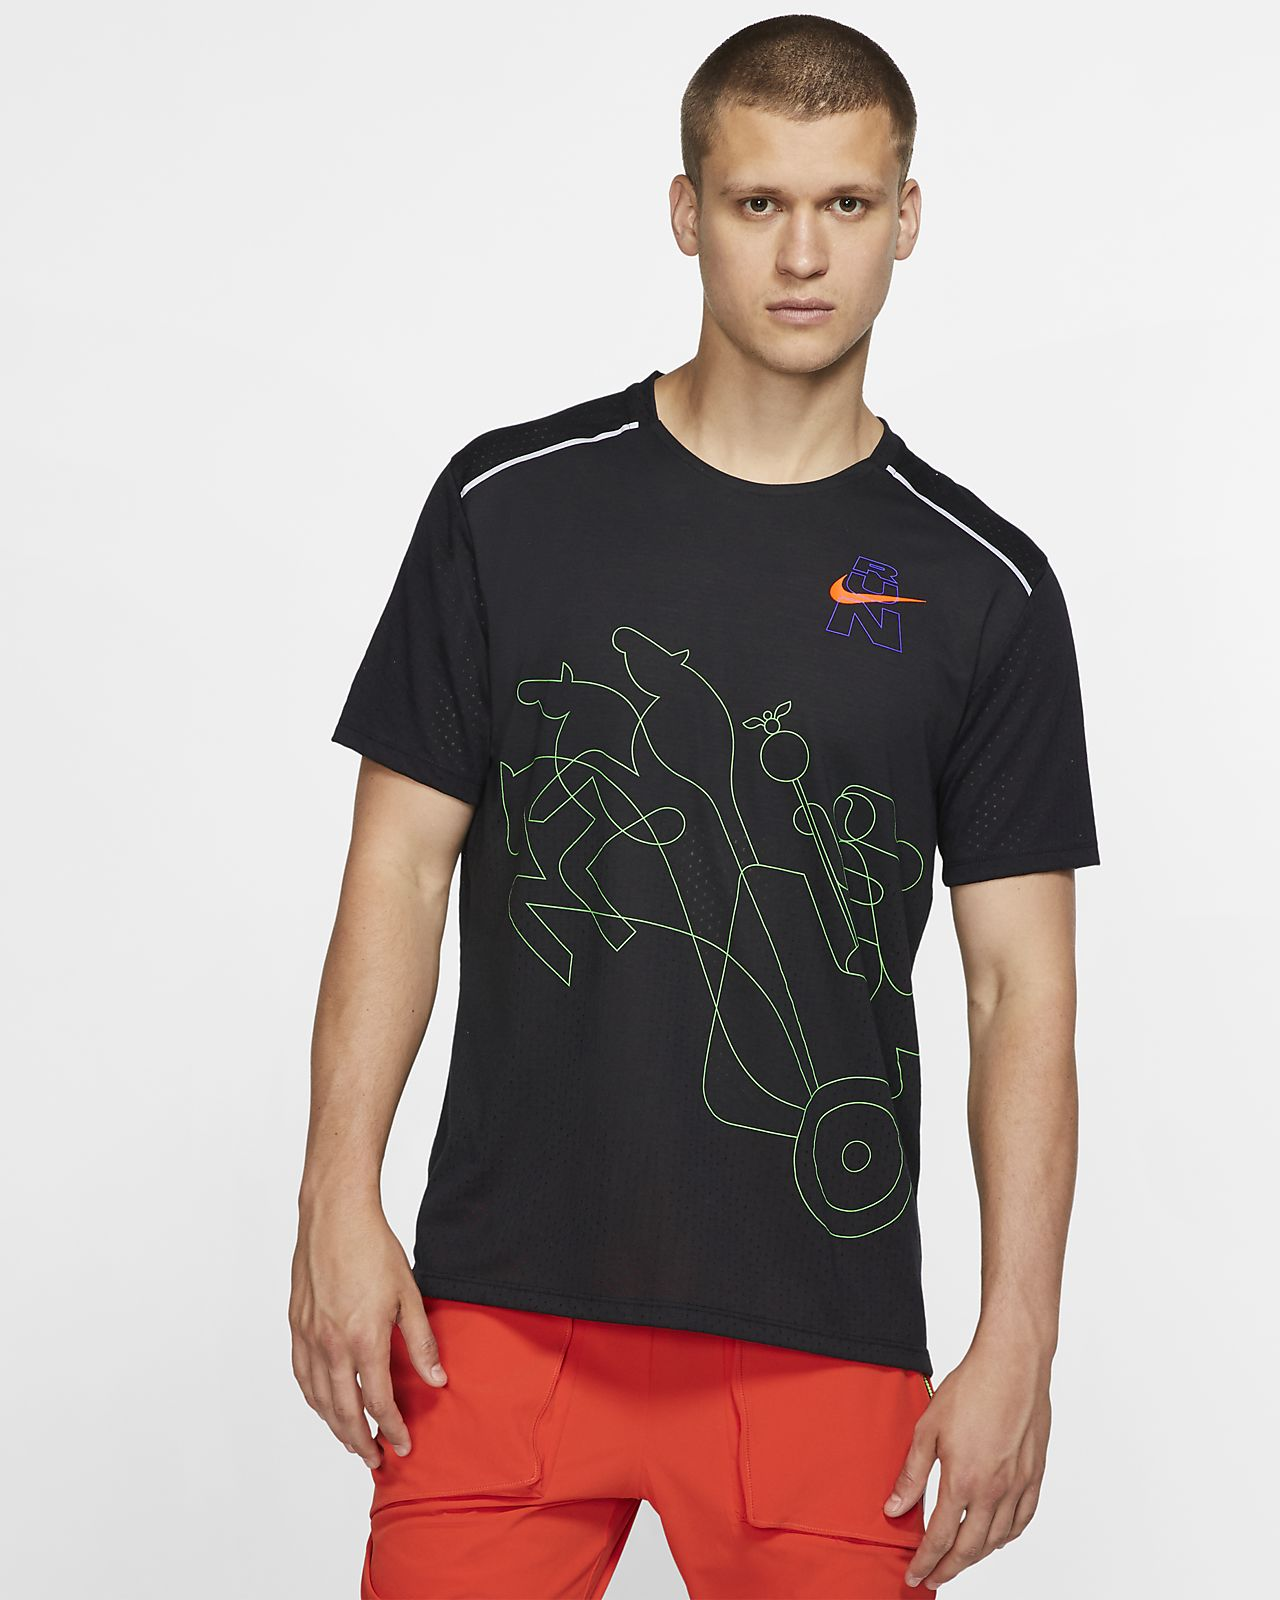 Prenda para la parte superior de running de manga corta para hombre Nike Rise 365 (London)